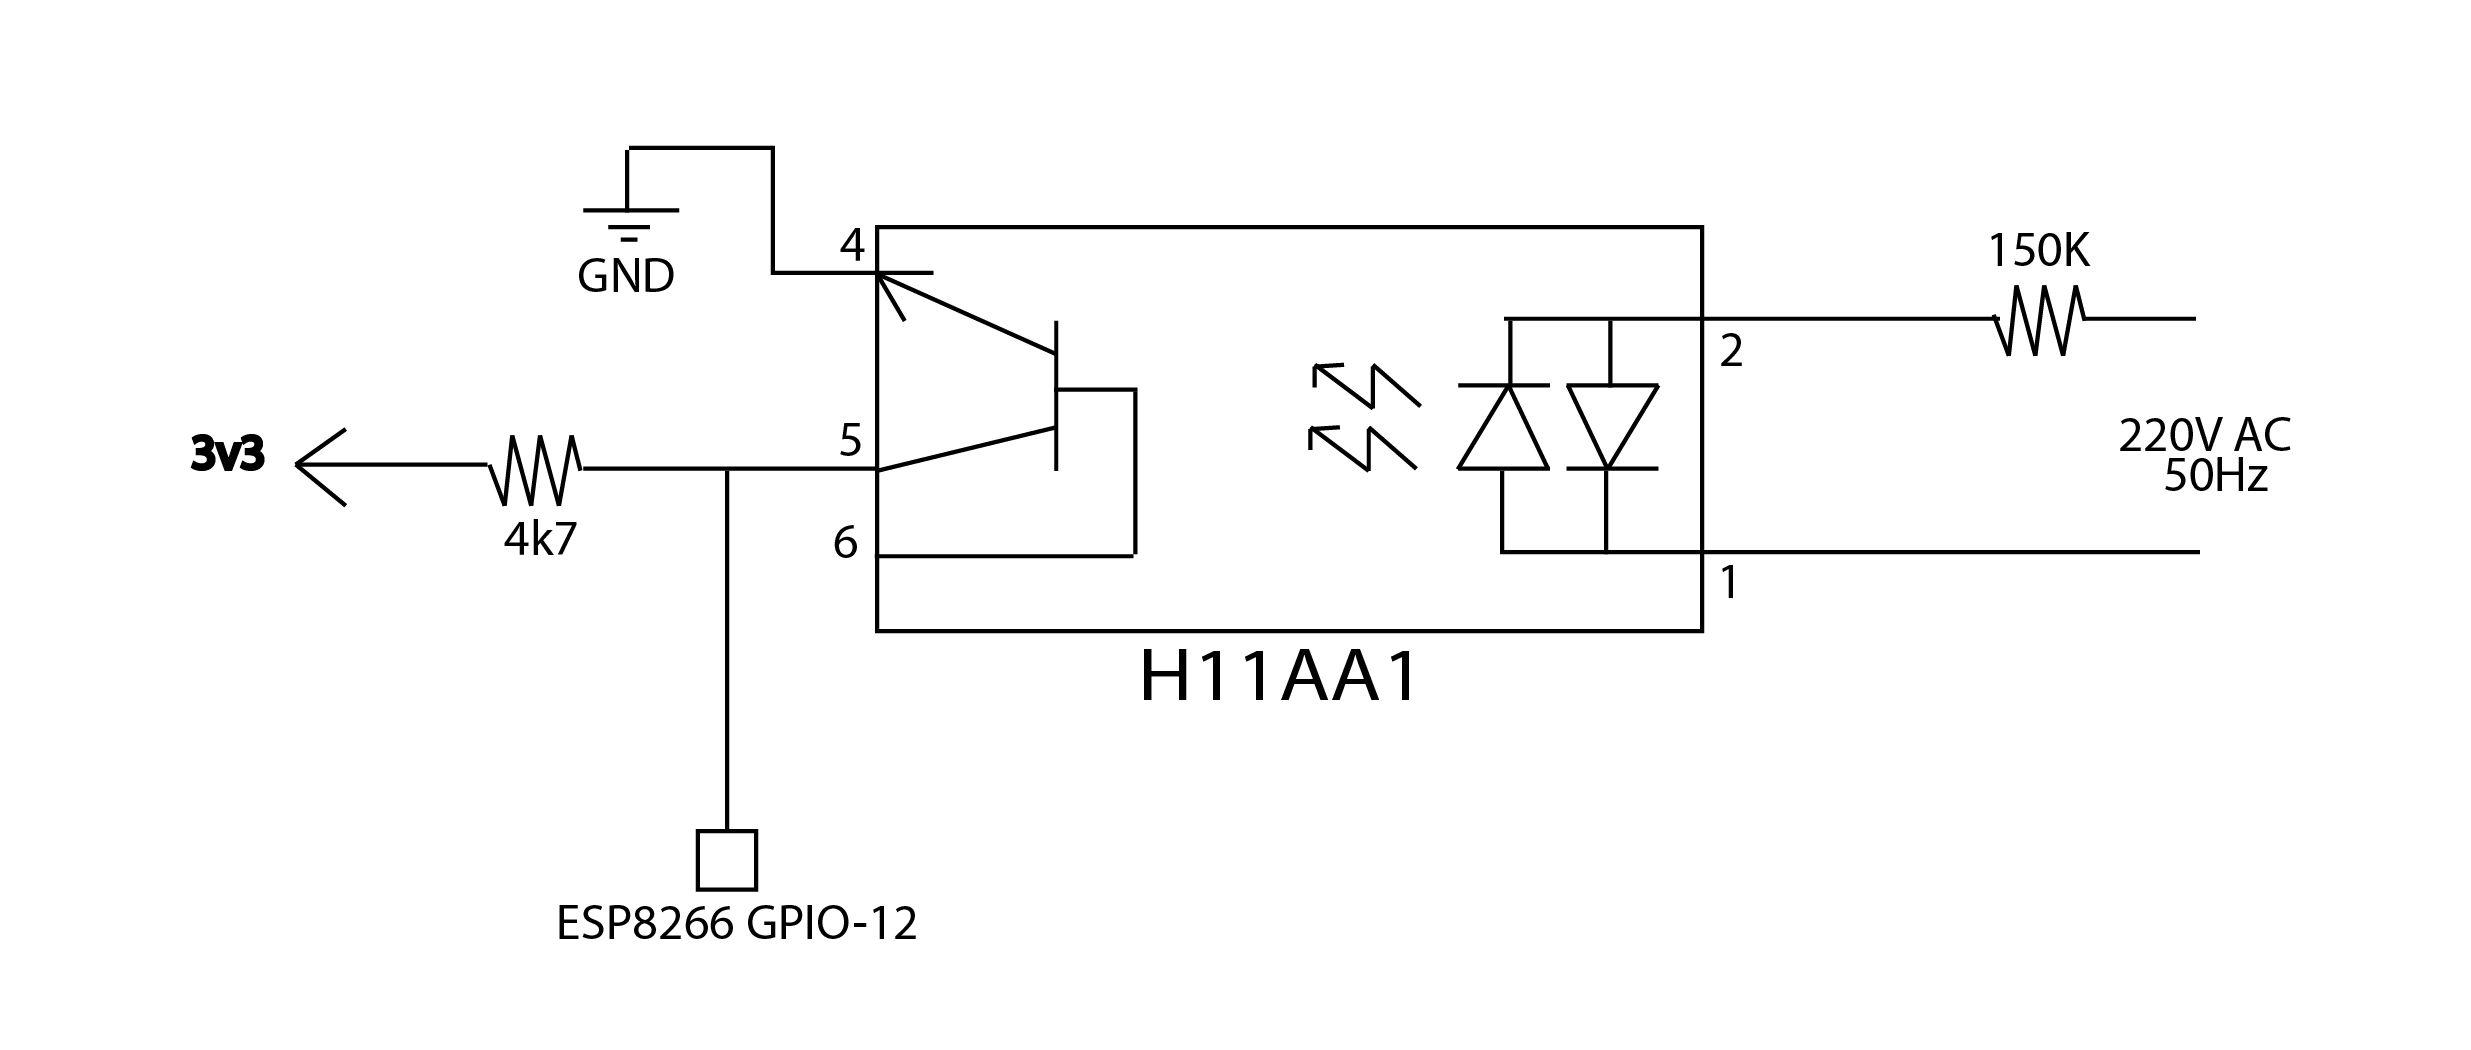 triac zero cross detector problem electrical engineering stack with regard to overflow detection circuit [ 2471 x 1050 Pixel ]